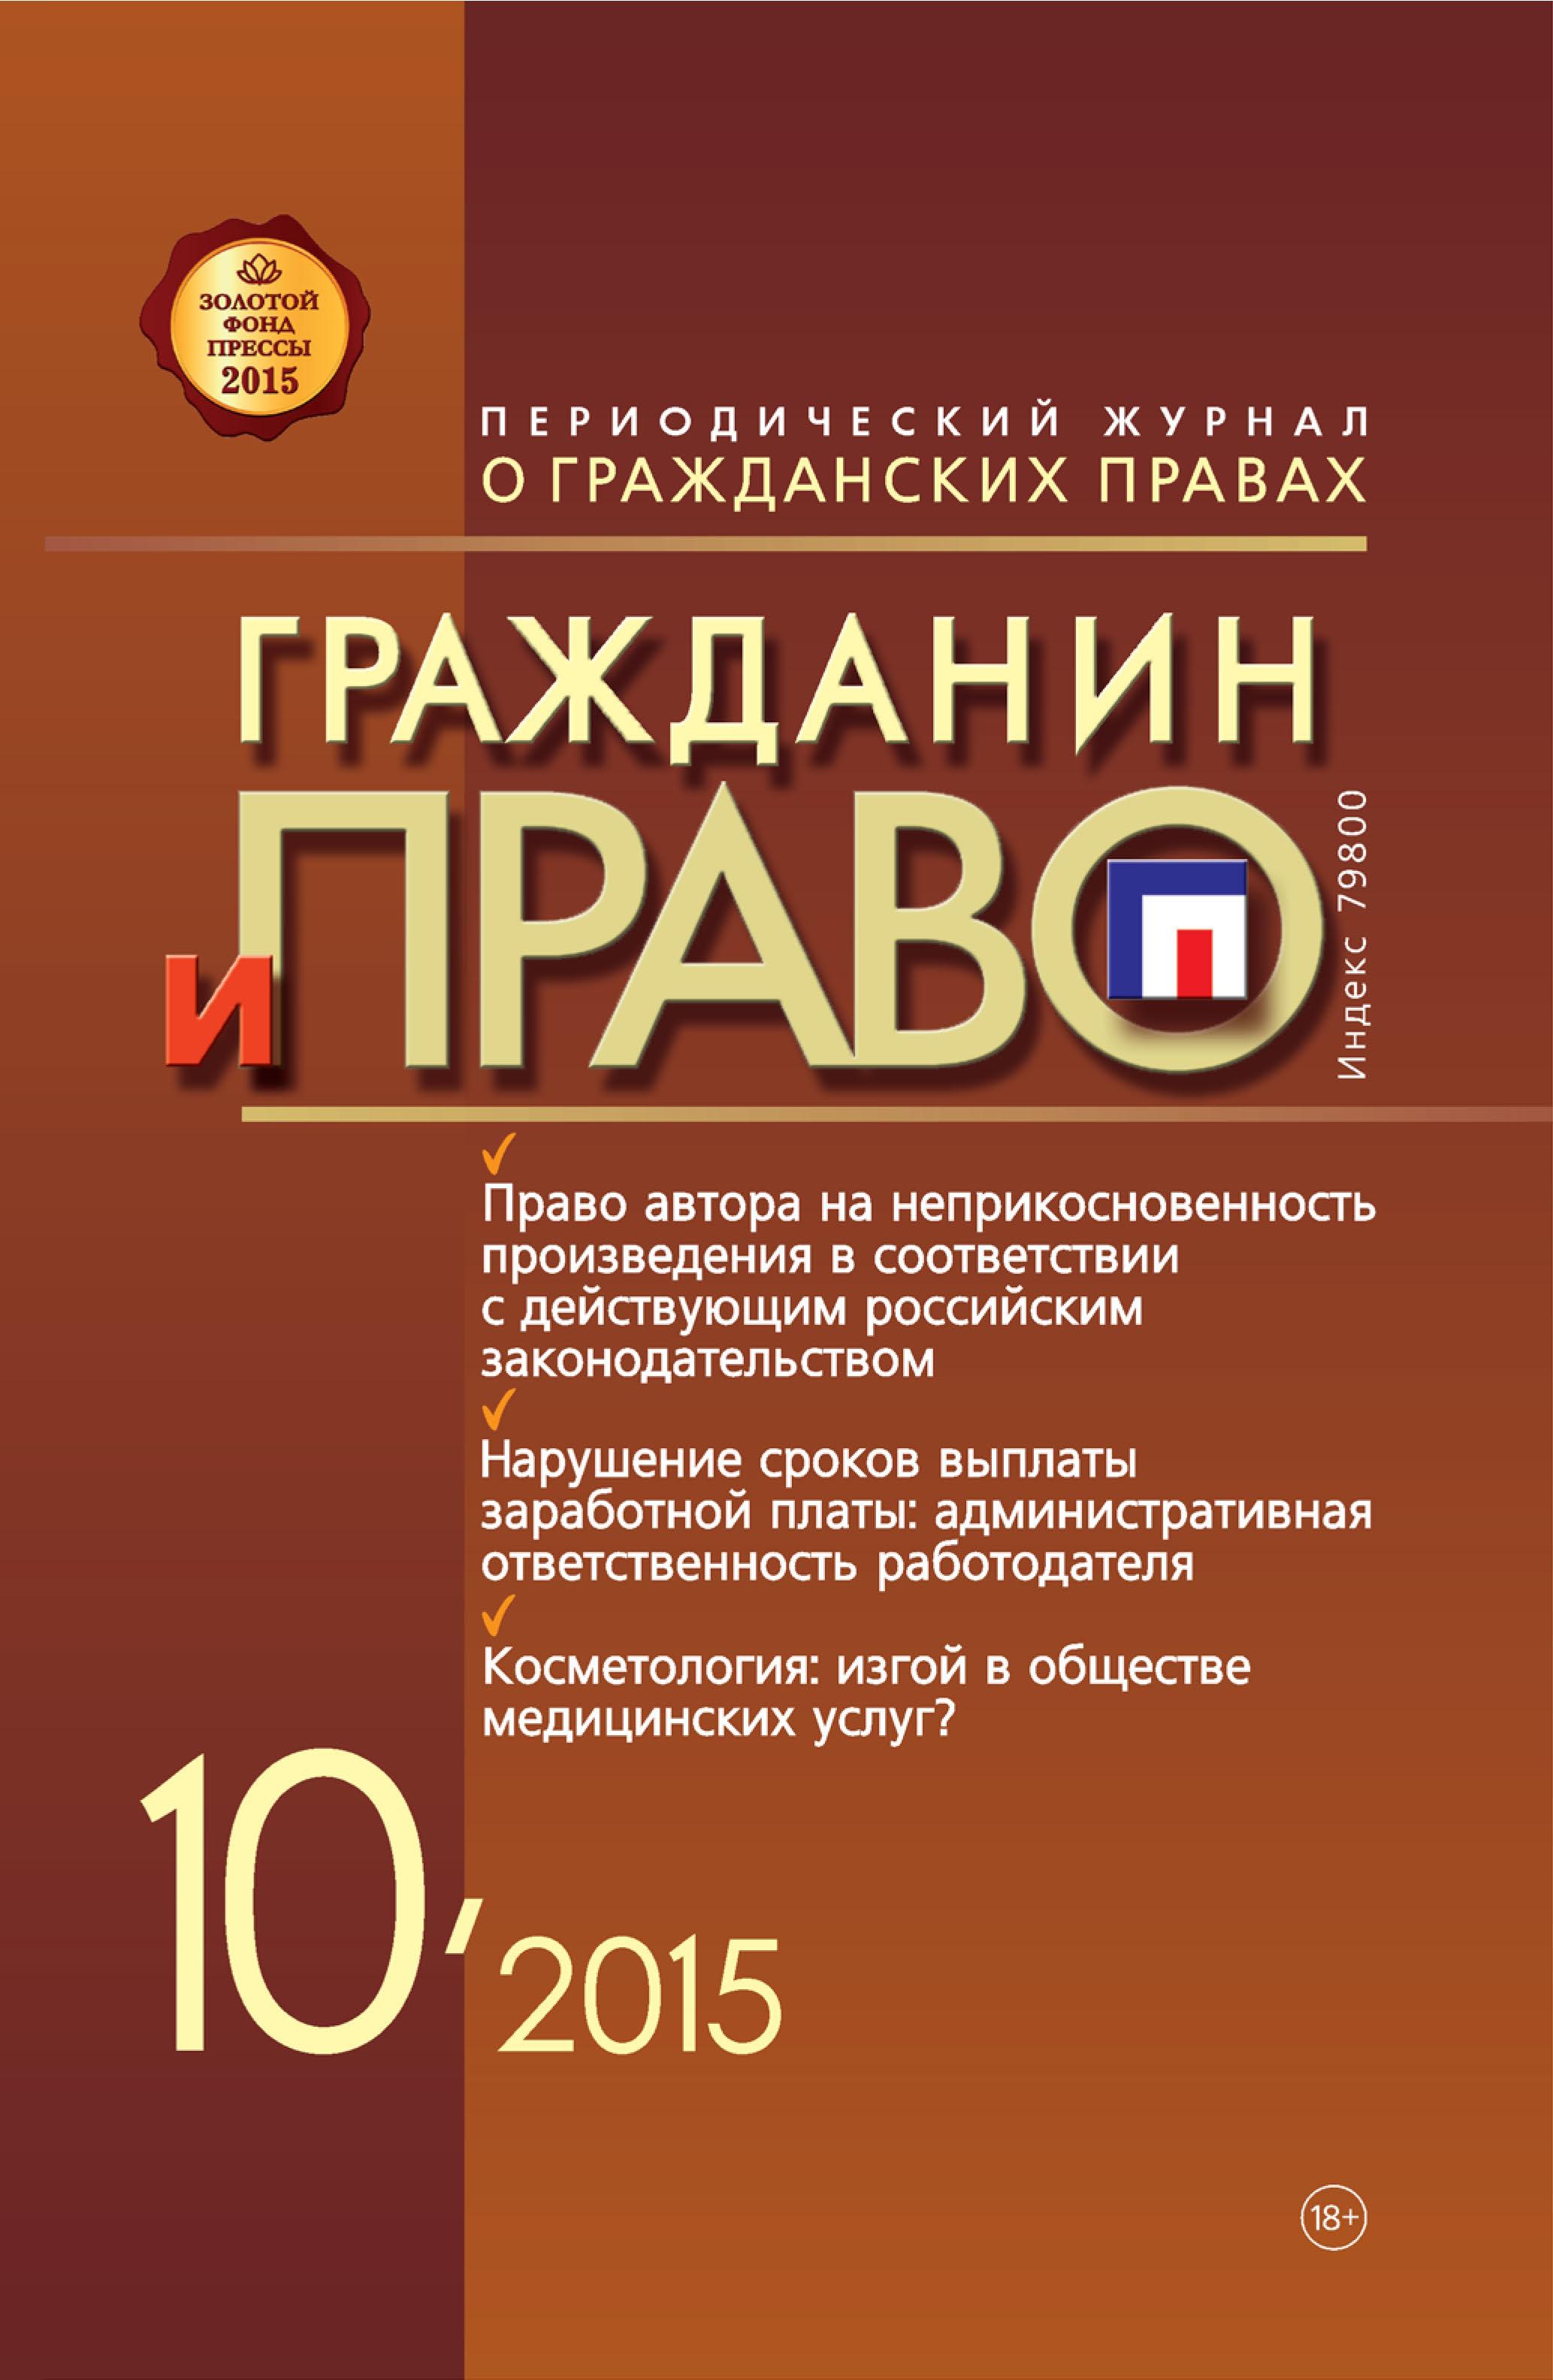 Гражданин и право №10/2015